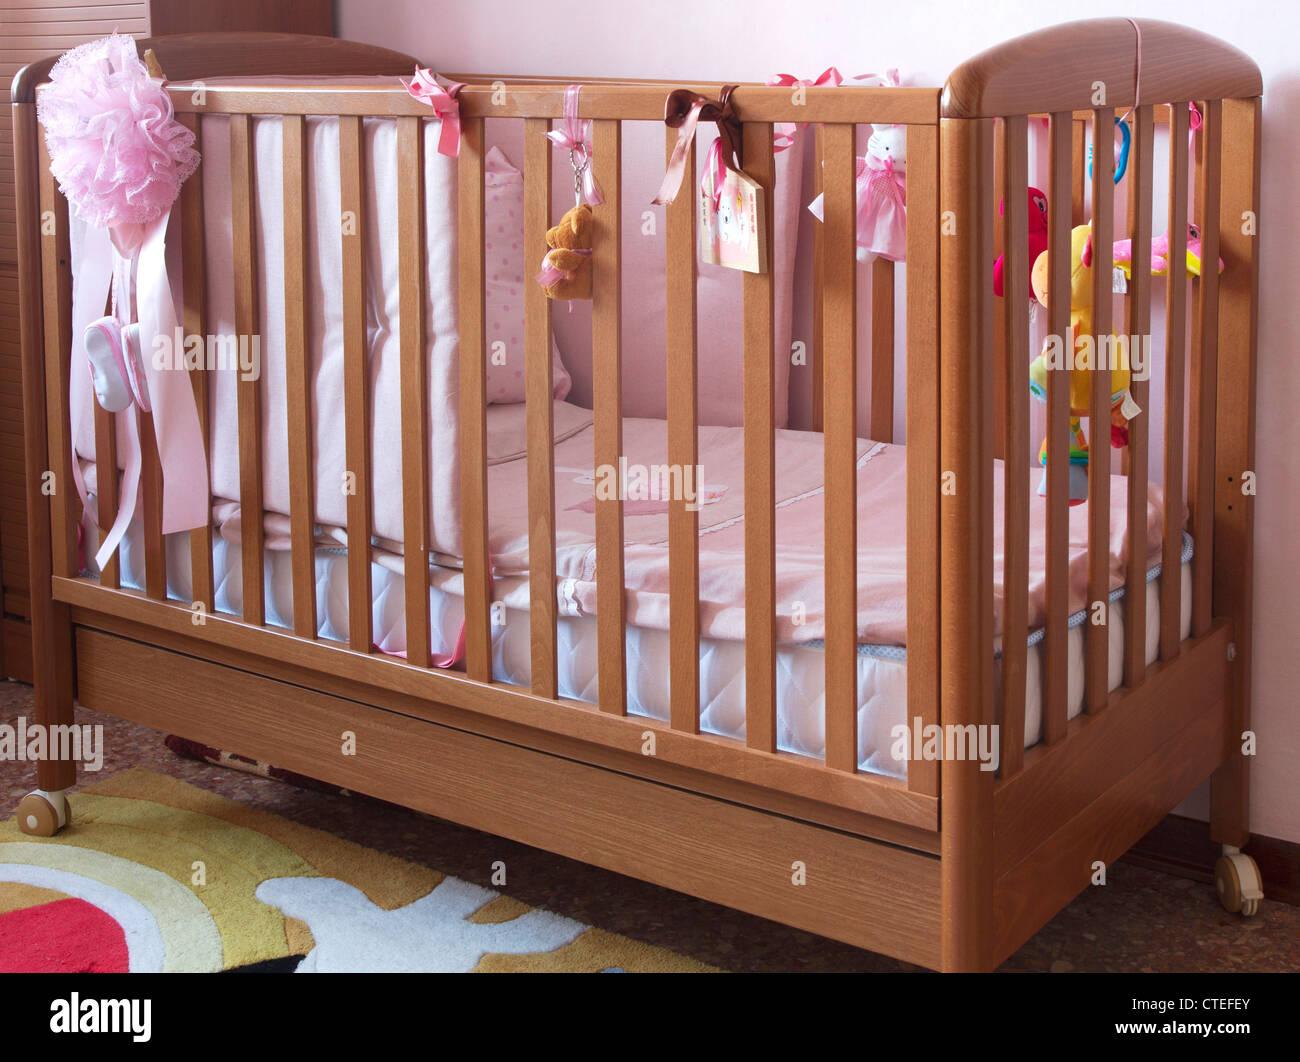 Berceau de bébé Photo Stock